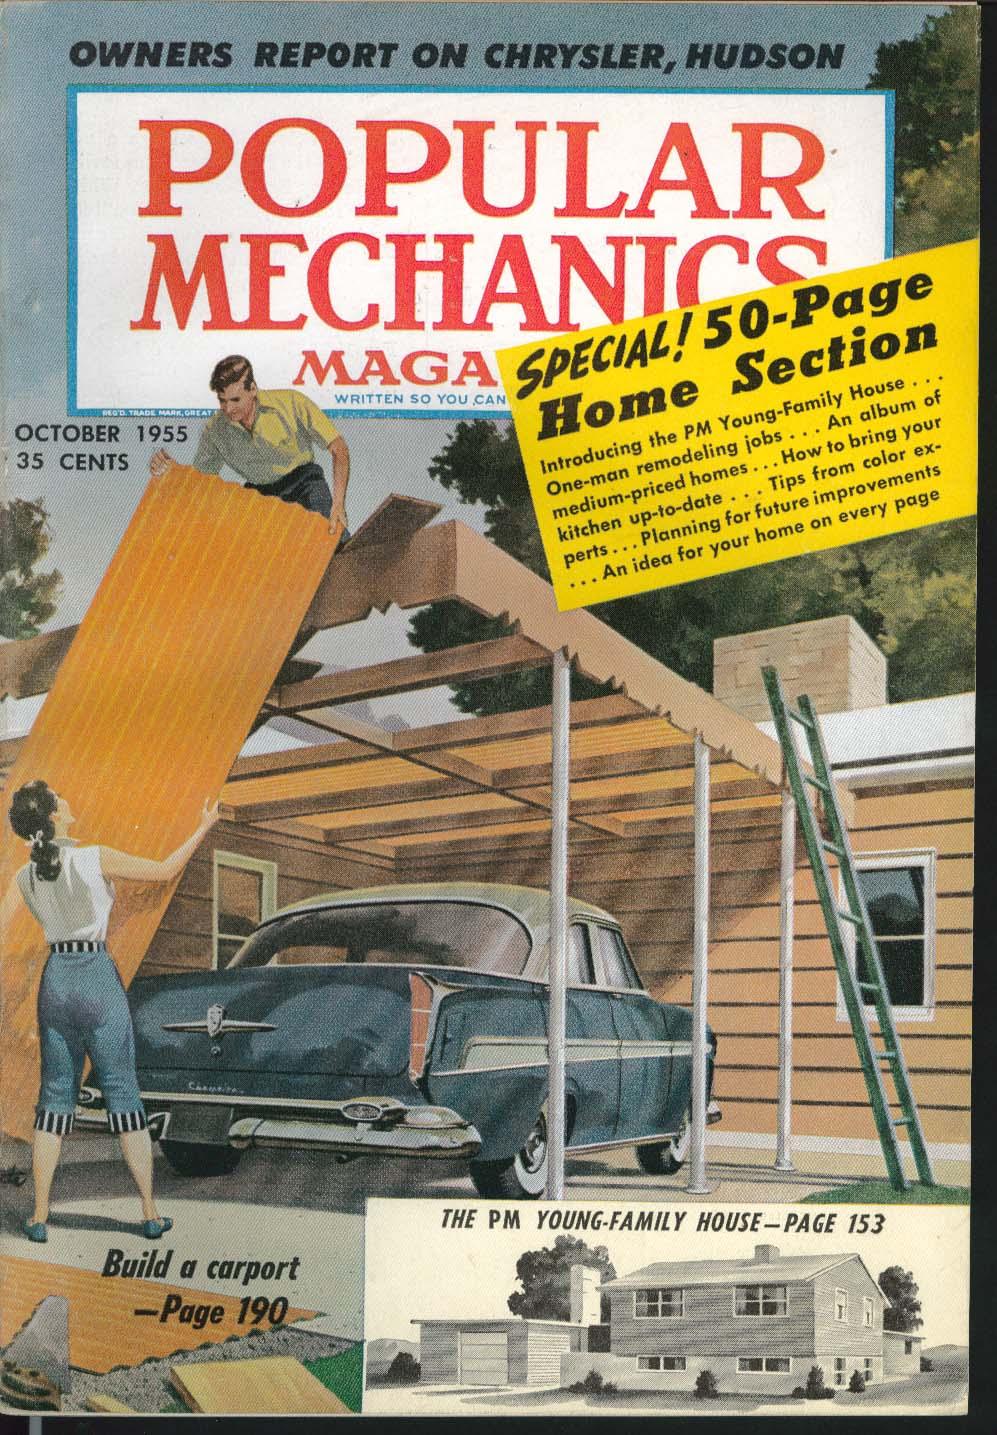 Image for POPULAR MECHANICS Chrysler Hudson Test Reports, Ford Mercury Styling ++ 10 1955